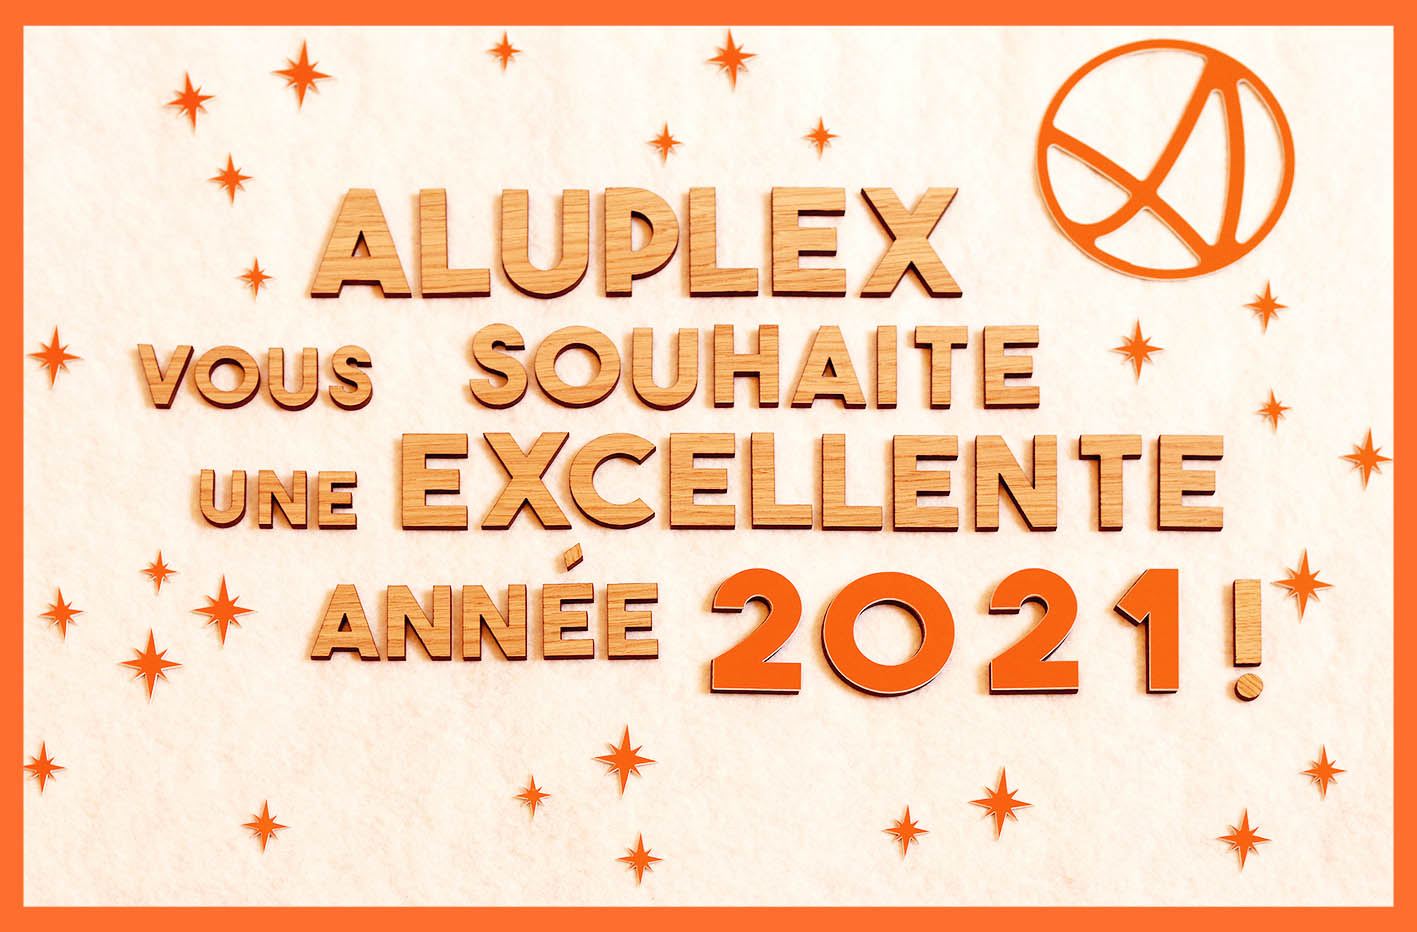 vœux aluplex signaletique 2021